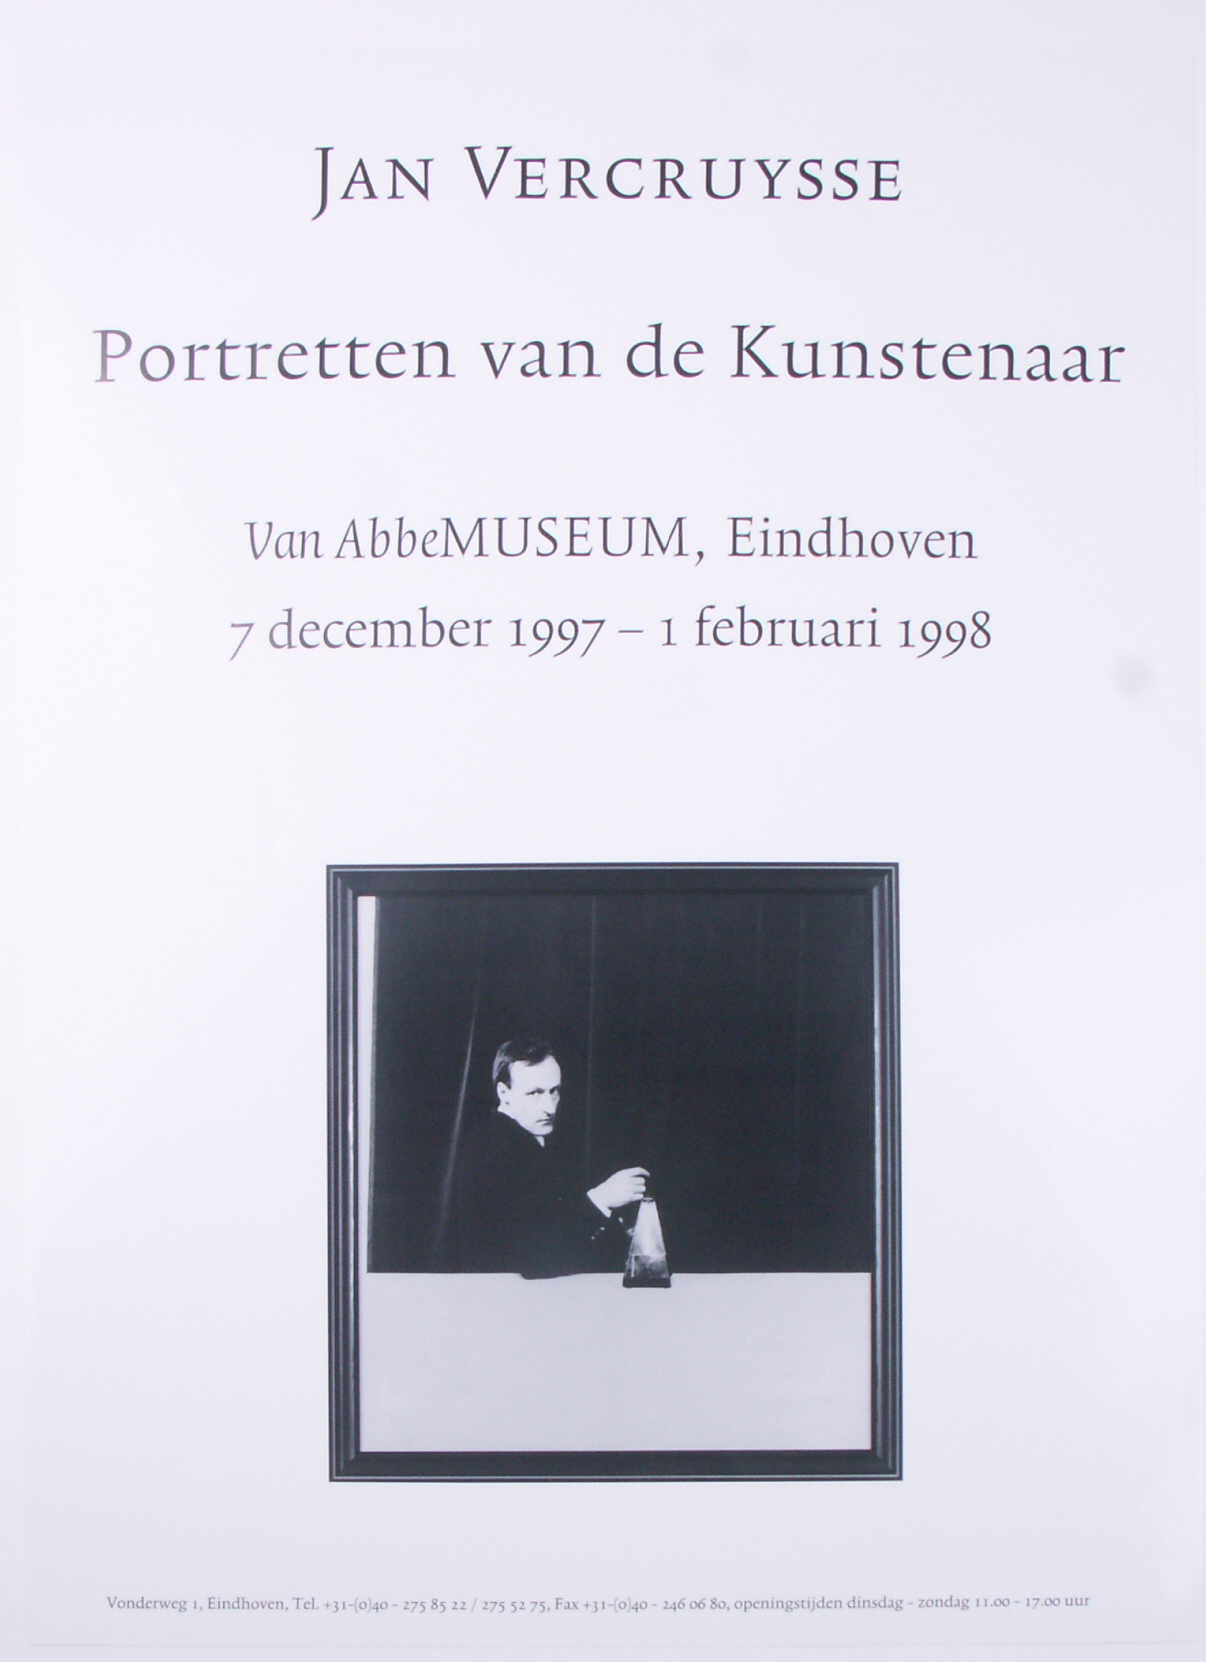 Jan Vercruysse